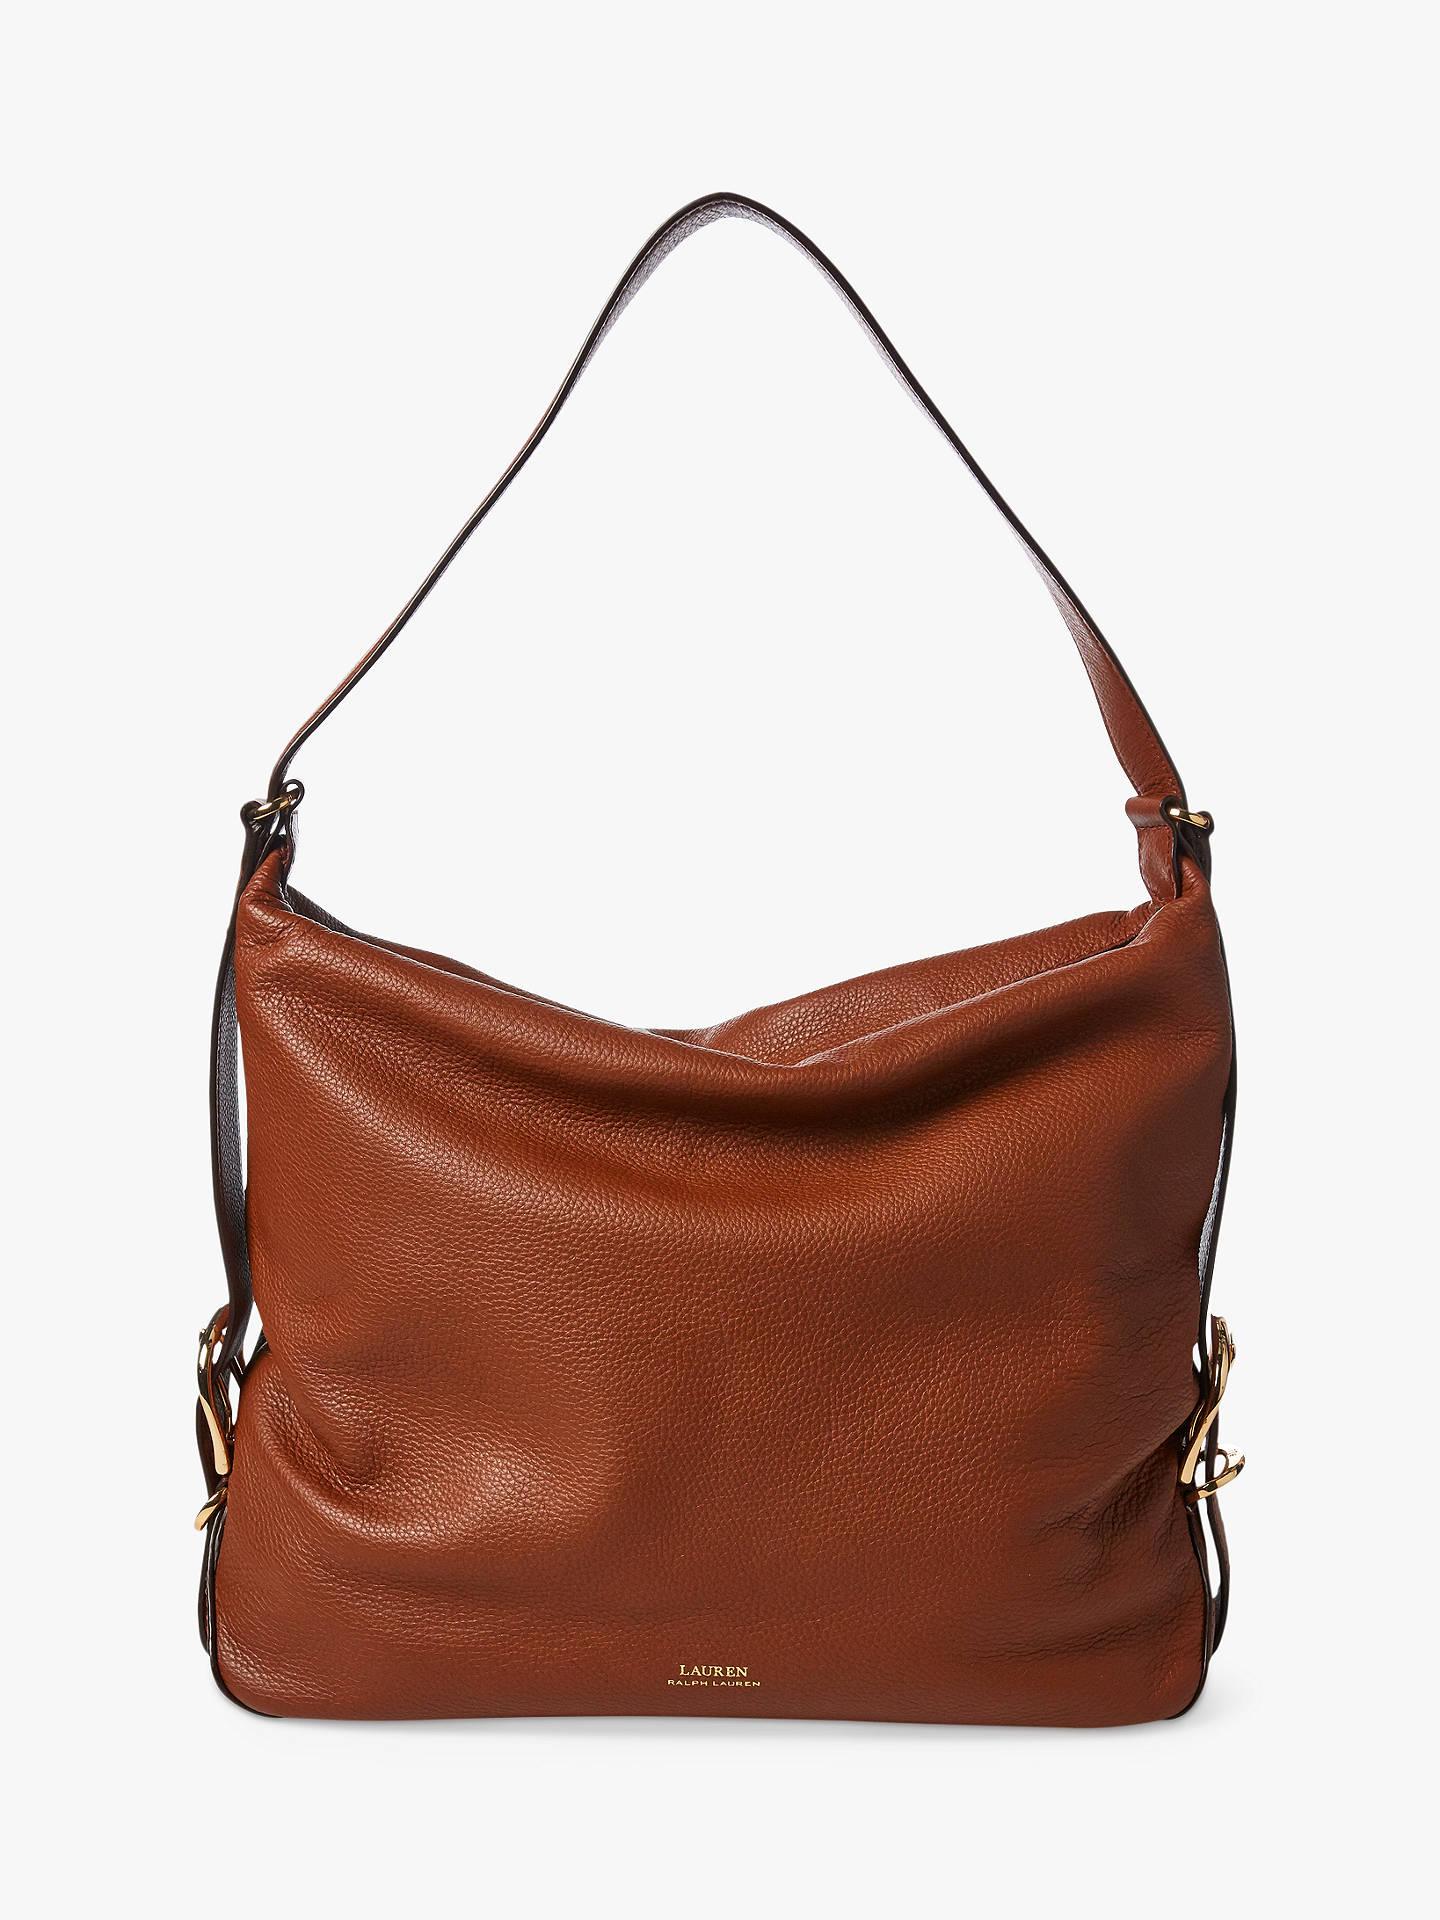 a0d817e95 Buy Lauren Ralph Lauren Cornwall Slouchy Leather Hobo Bag, Tan Online at  johnlewis.com ...